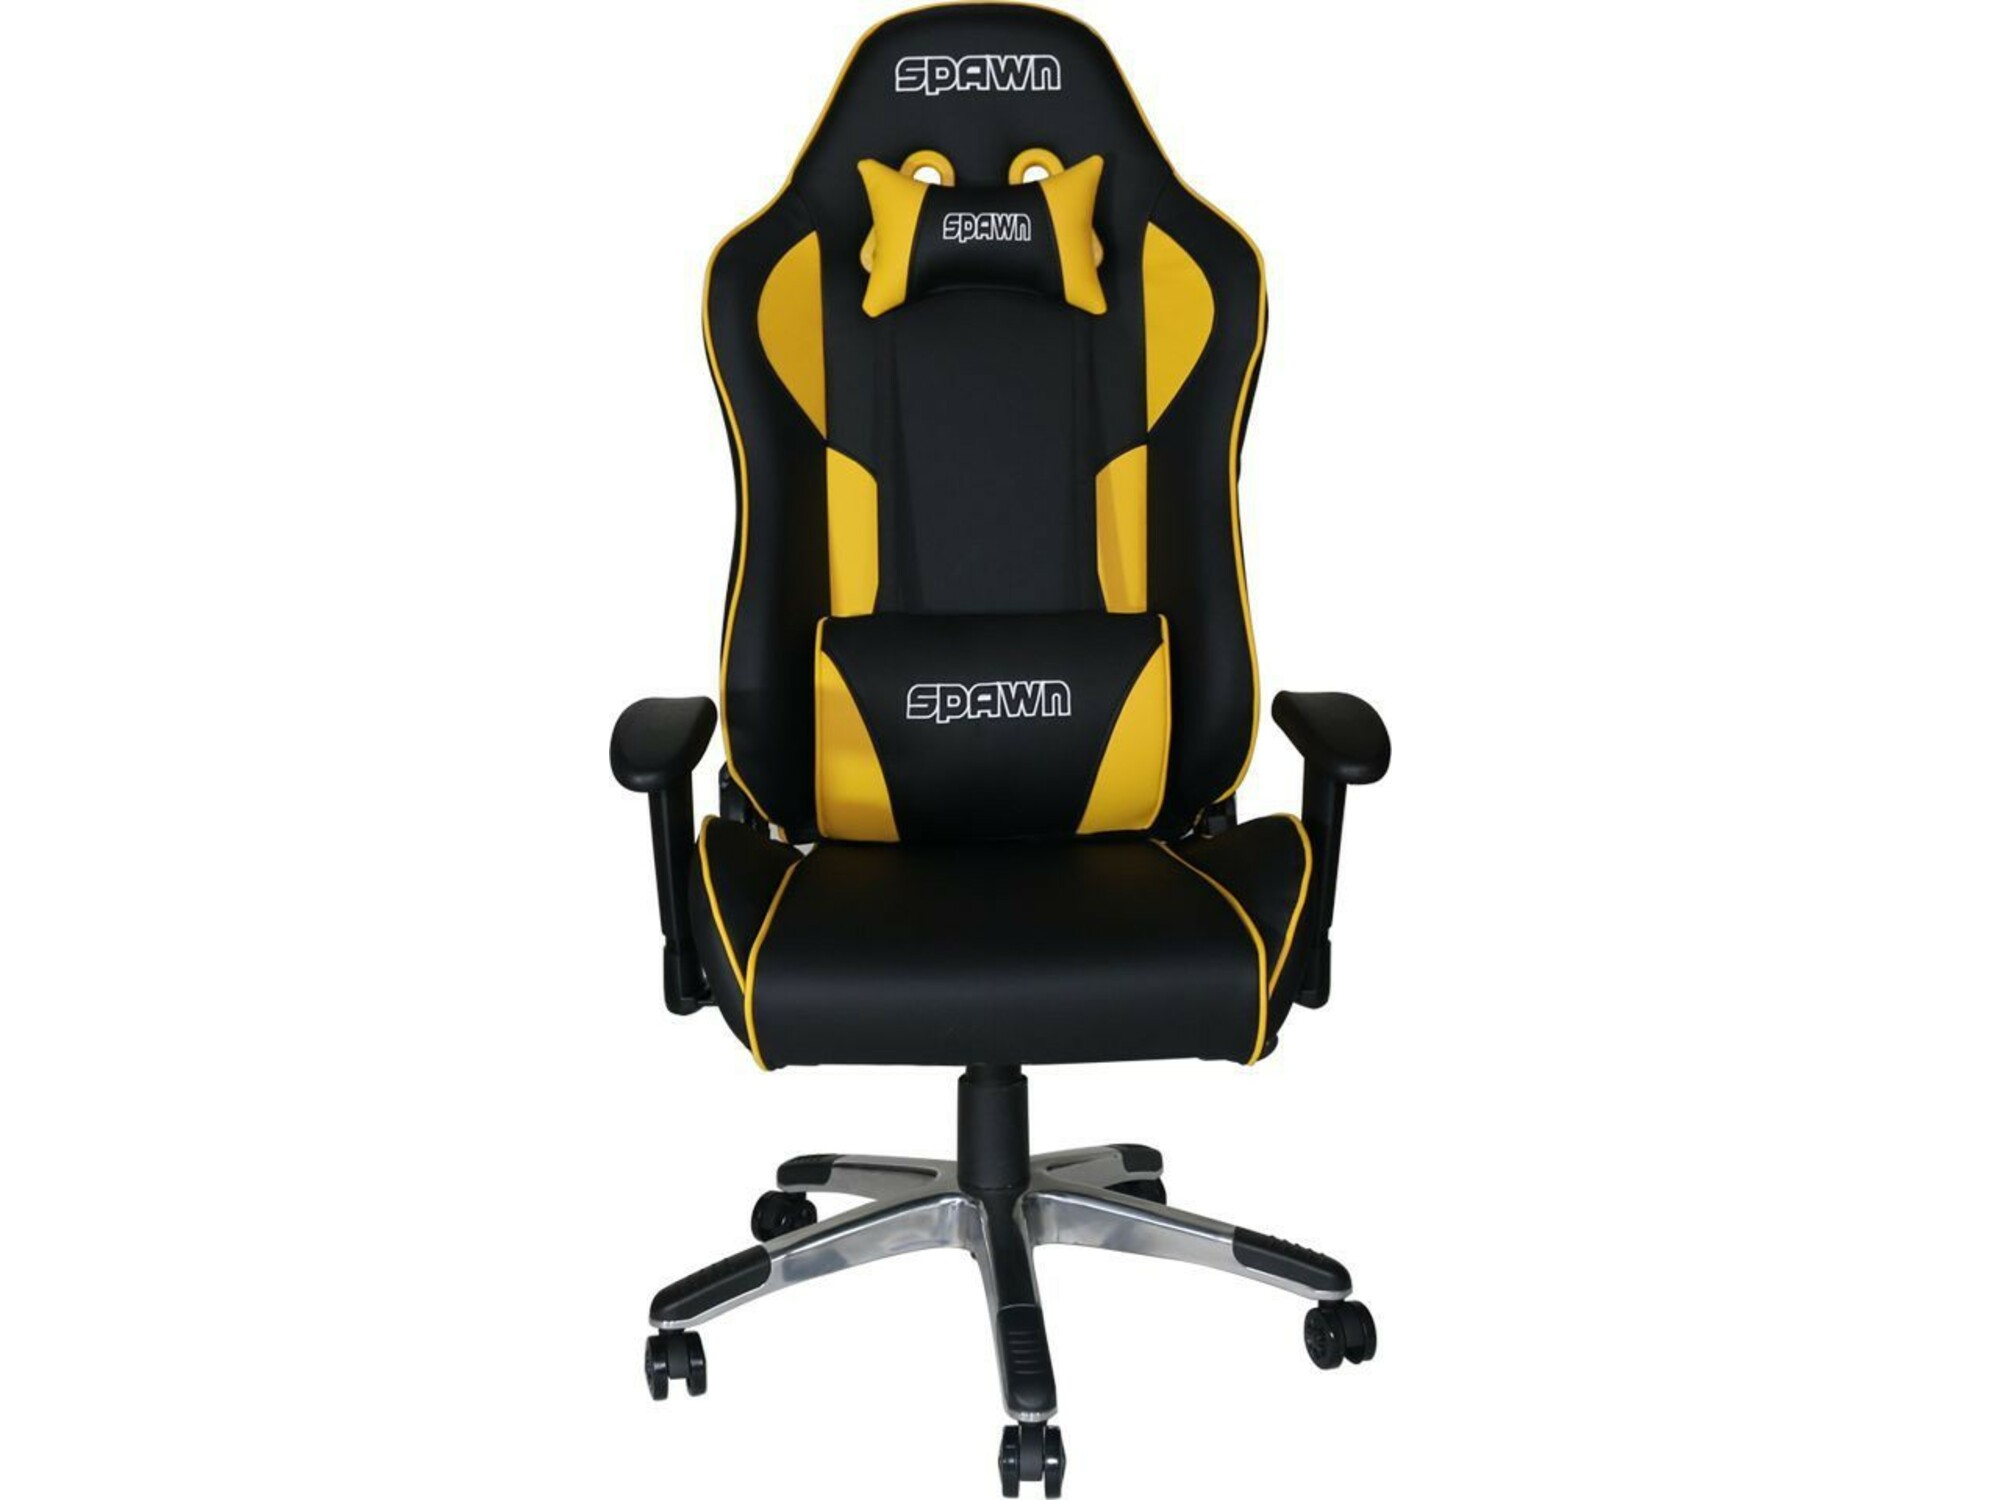 Spawn Gaming Chair Spawn Champion Series Yellow 29043